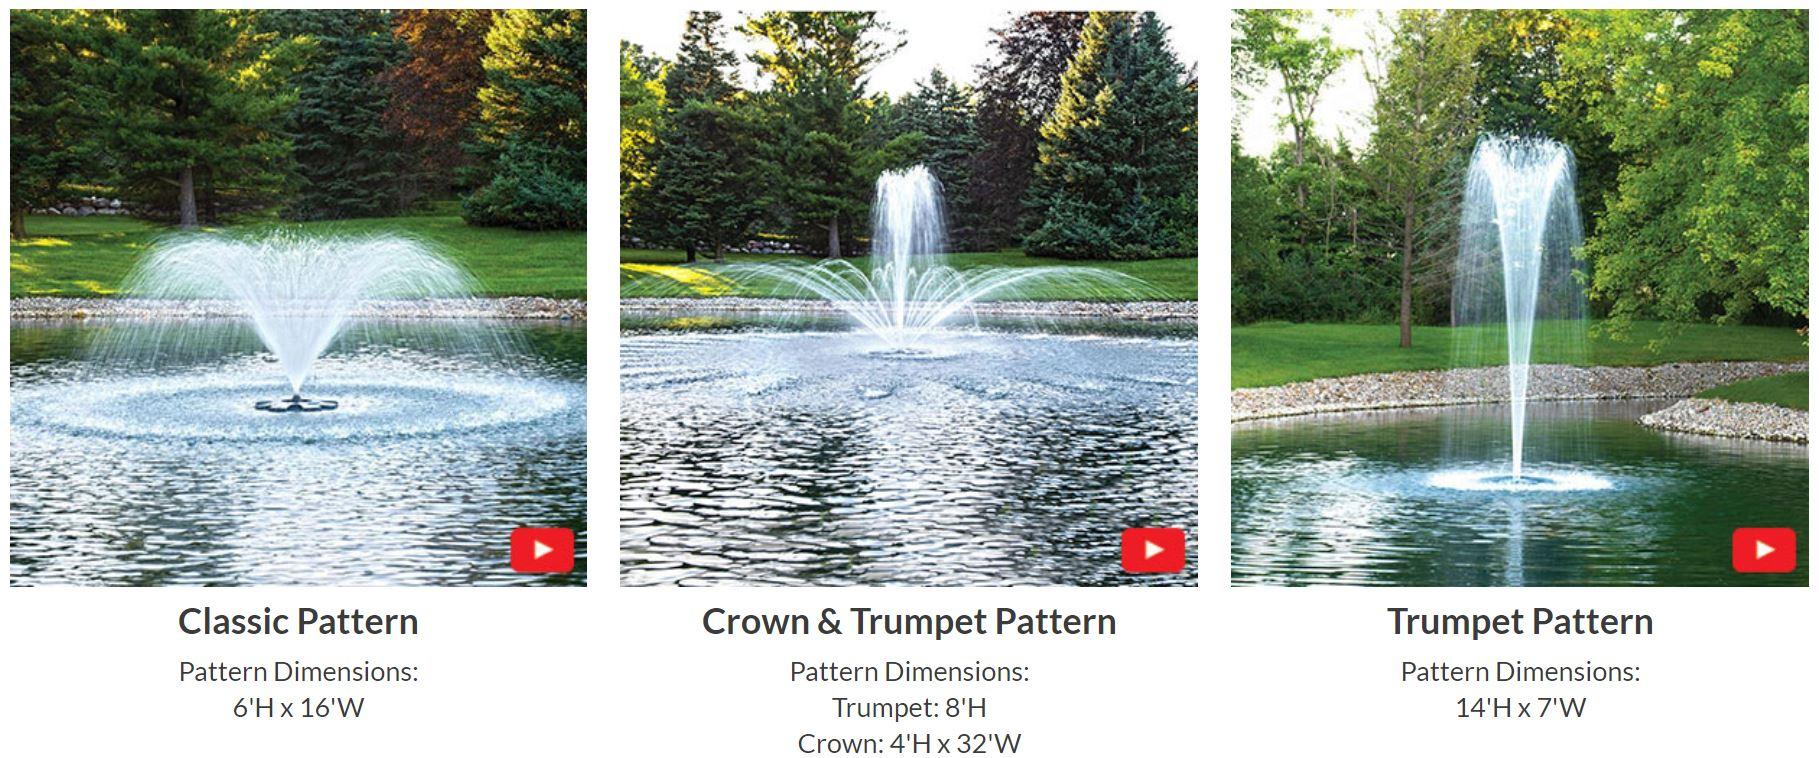 airmax-ecoseries-pond-fountains-standard-spray-patterns.aqua-link.jpg